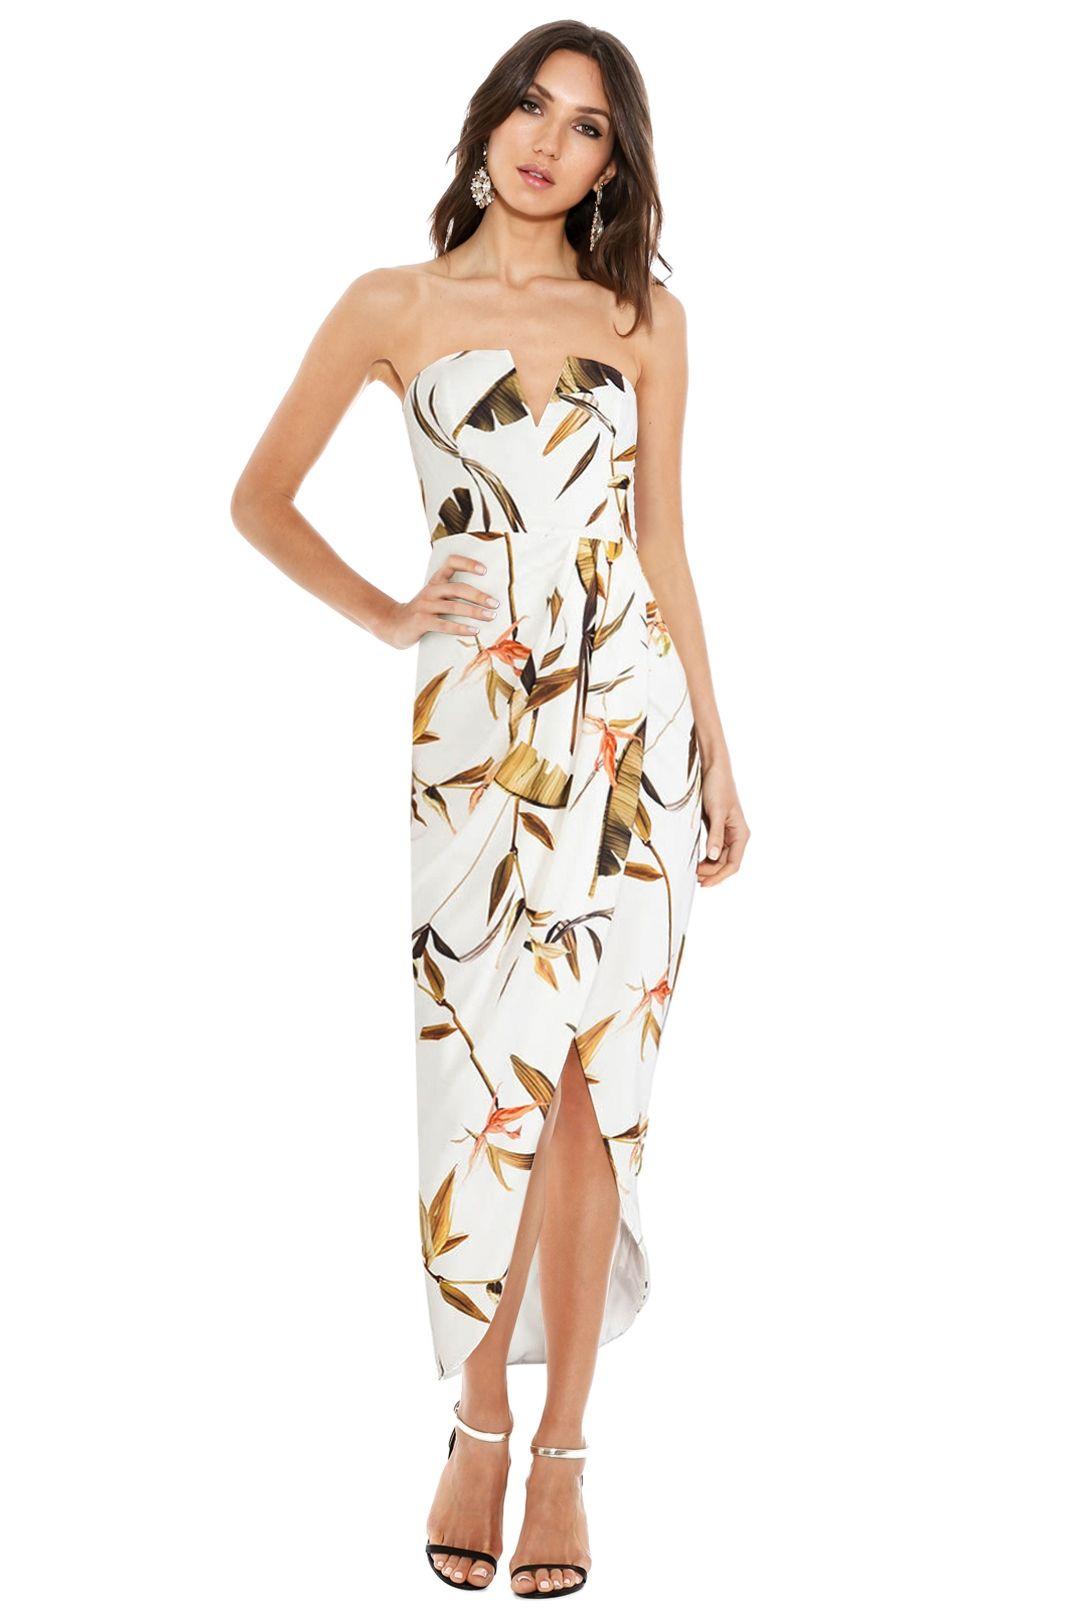 Shona Joy - Rapture Dress - Cream - Front